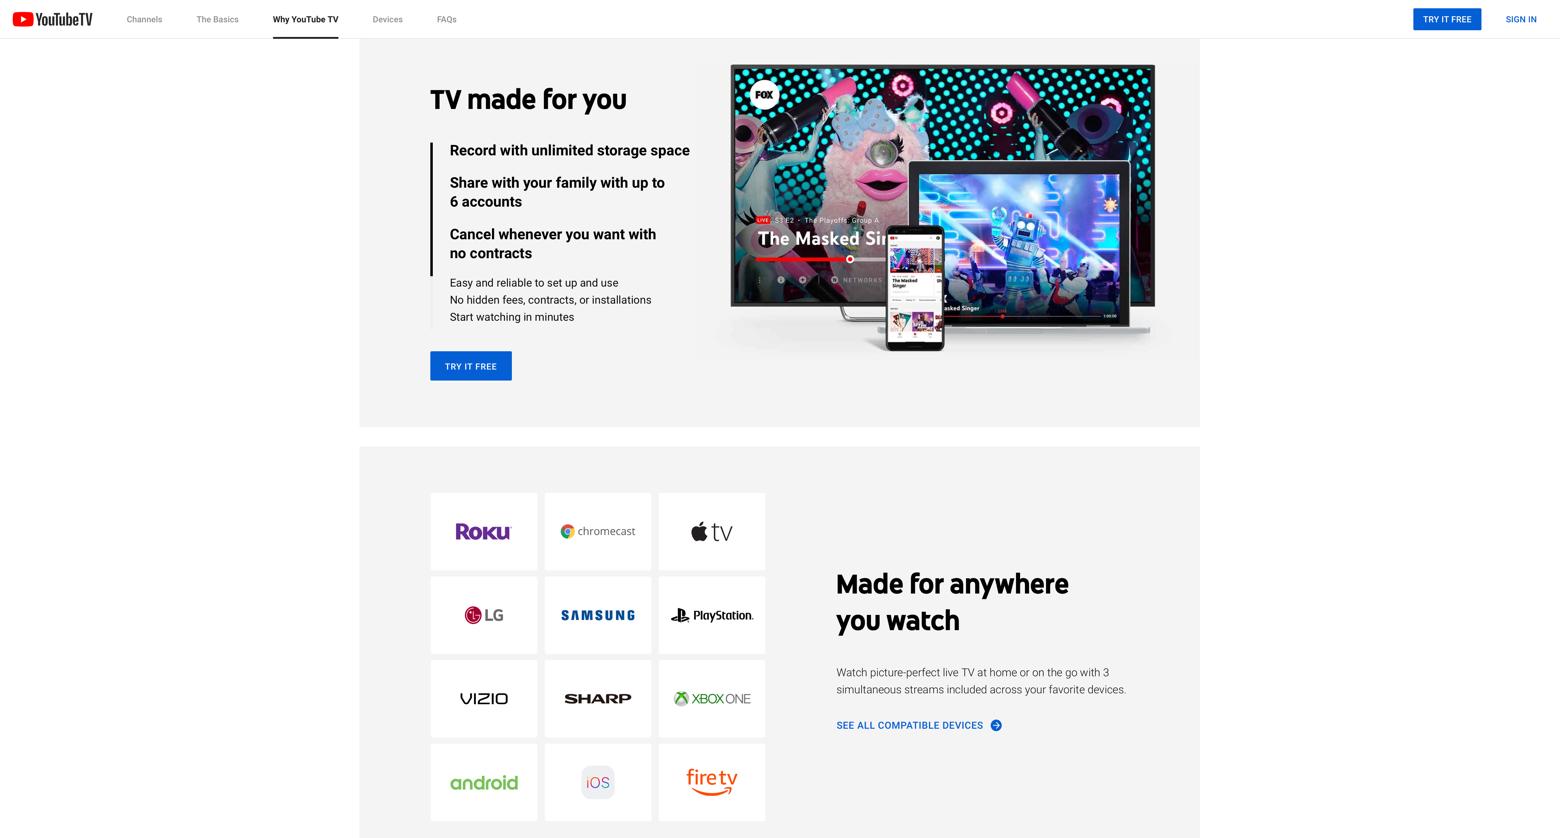 YouTube TV website